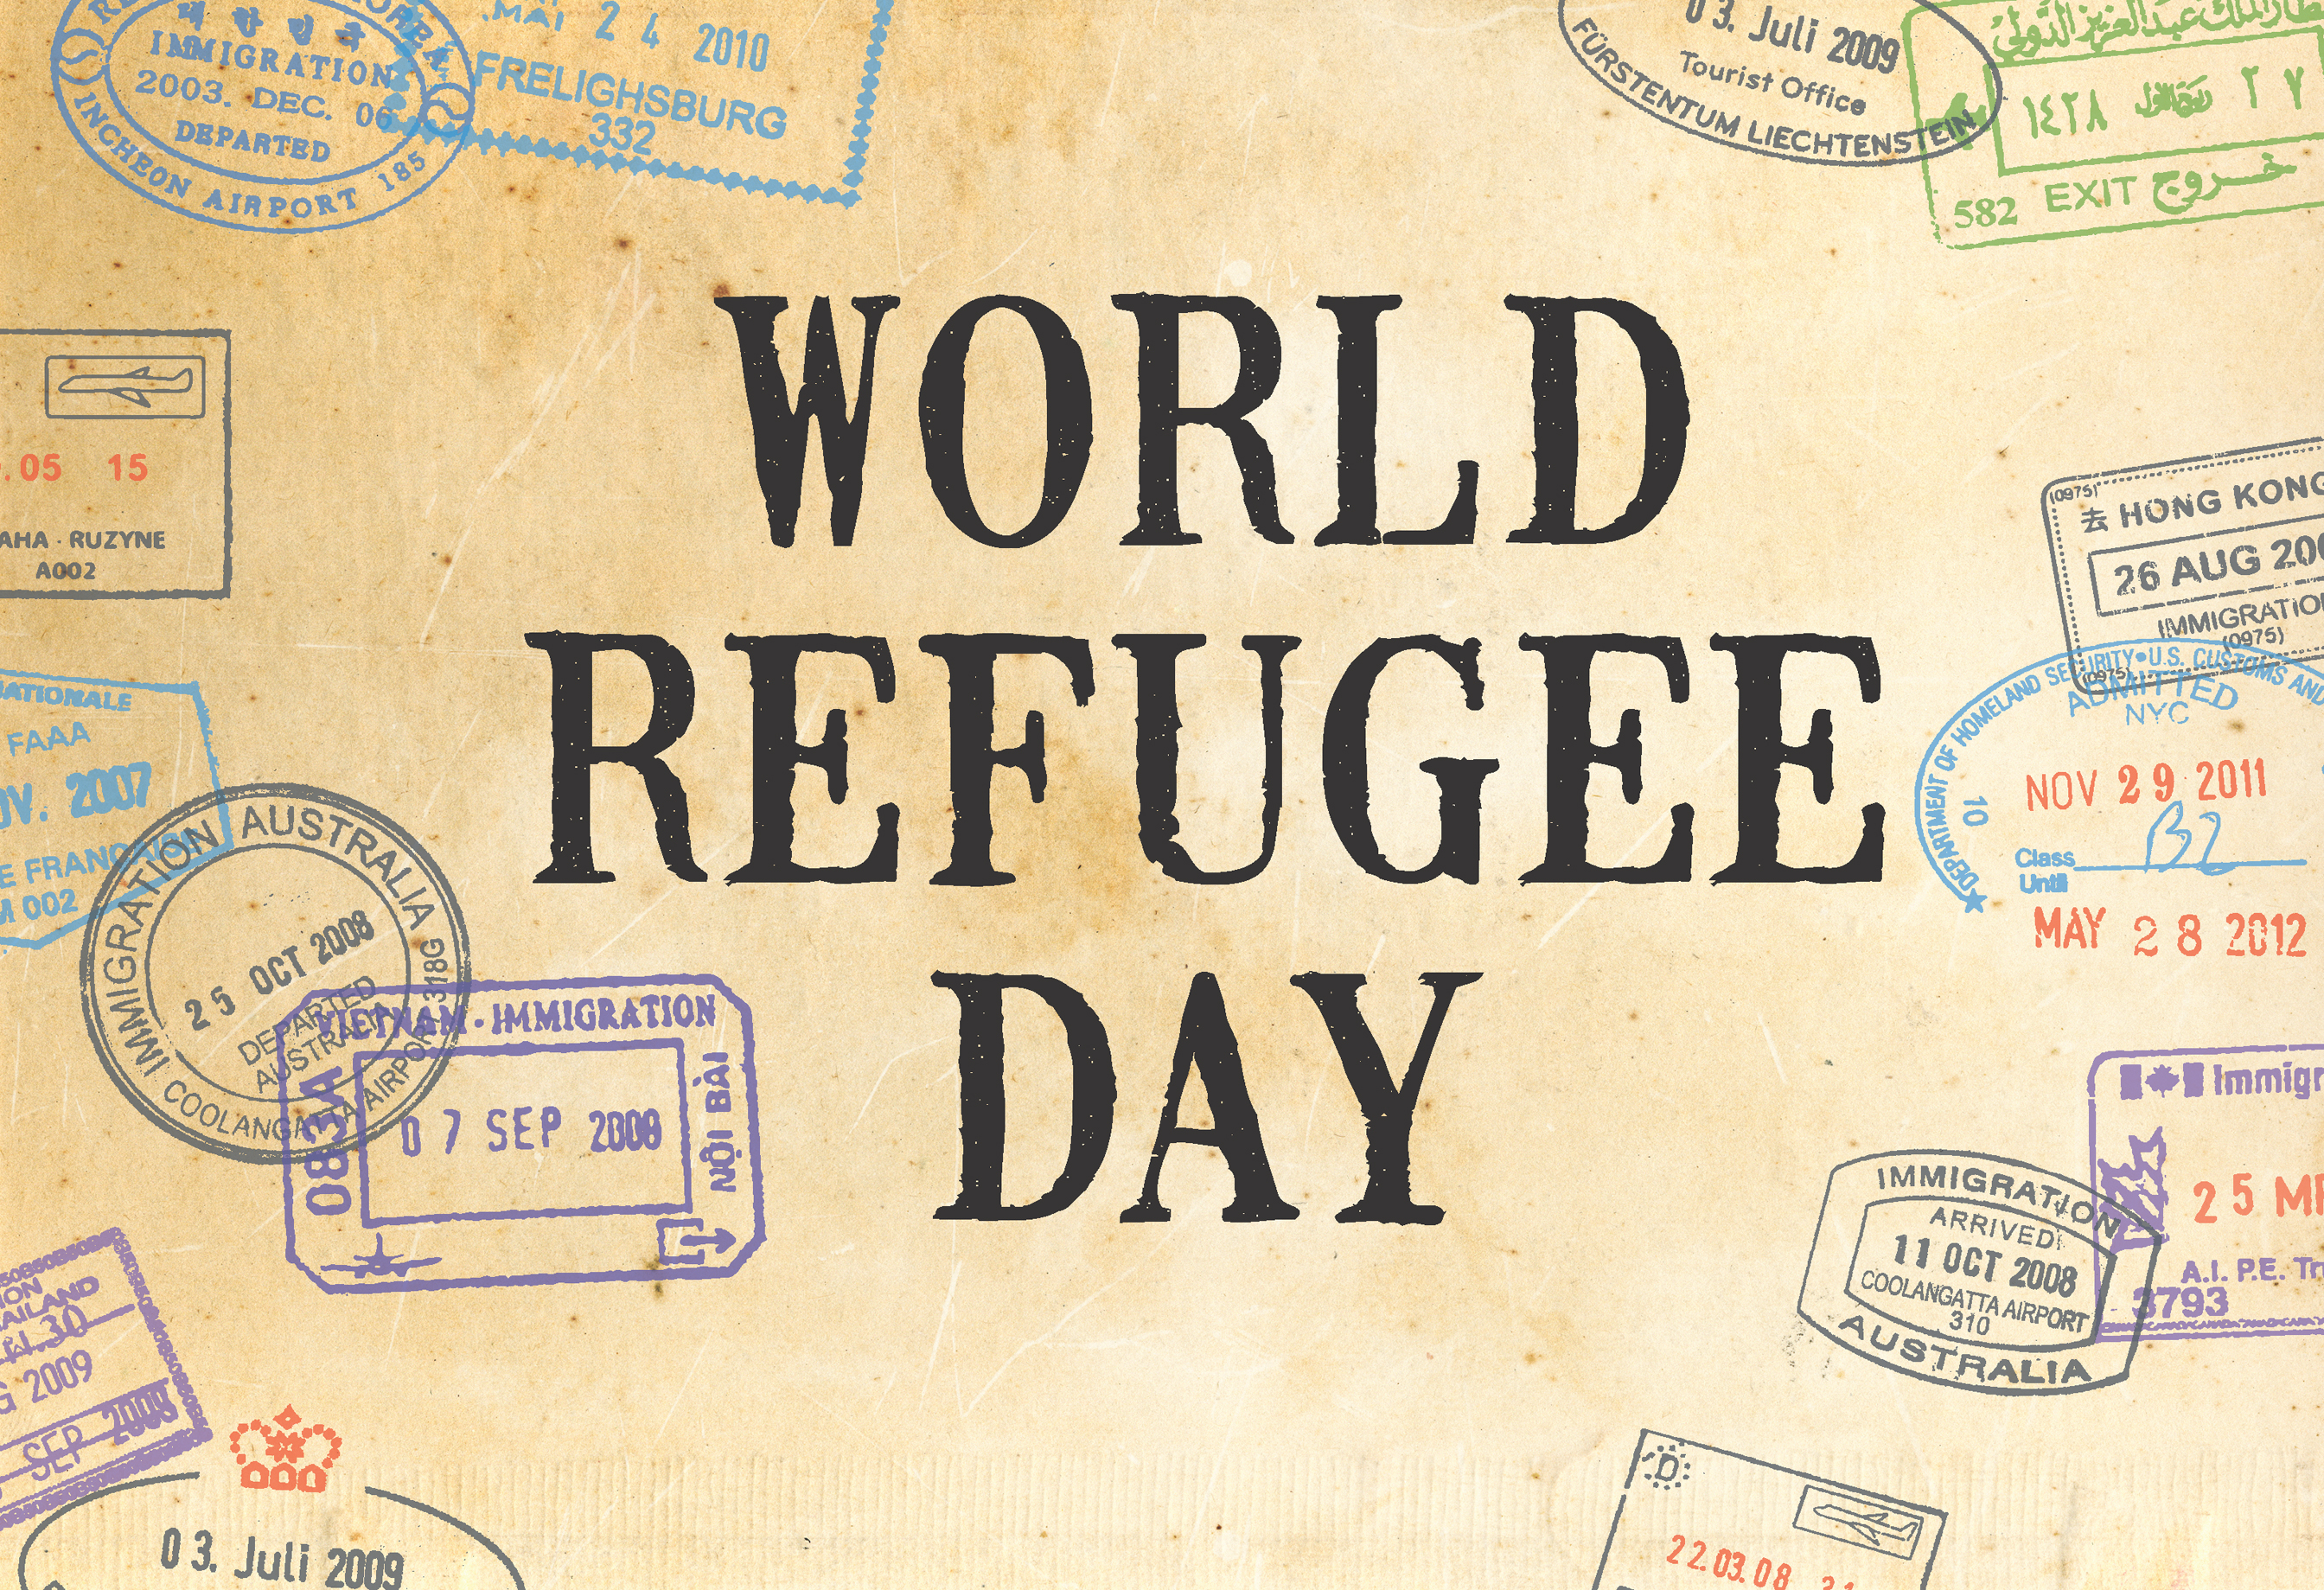 World-Refugee-Day-2013-event